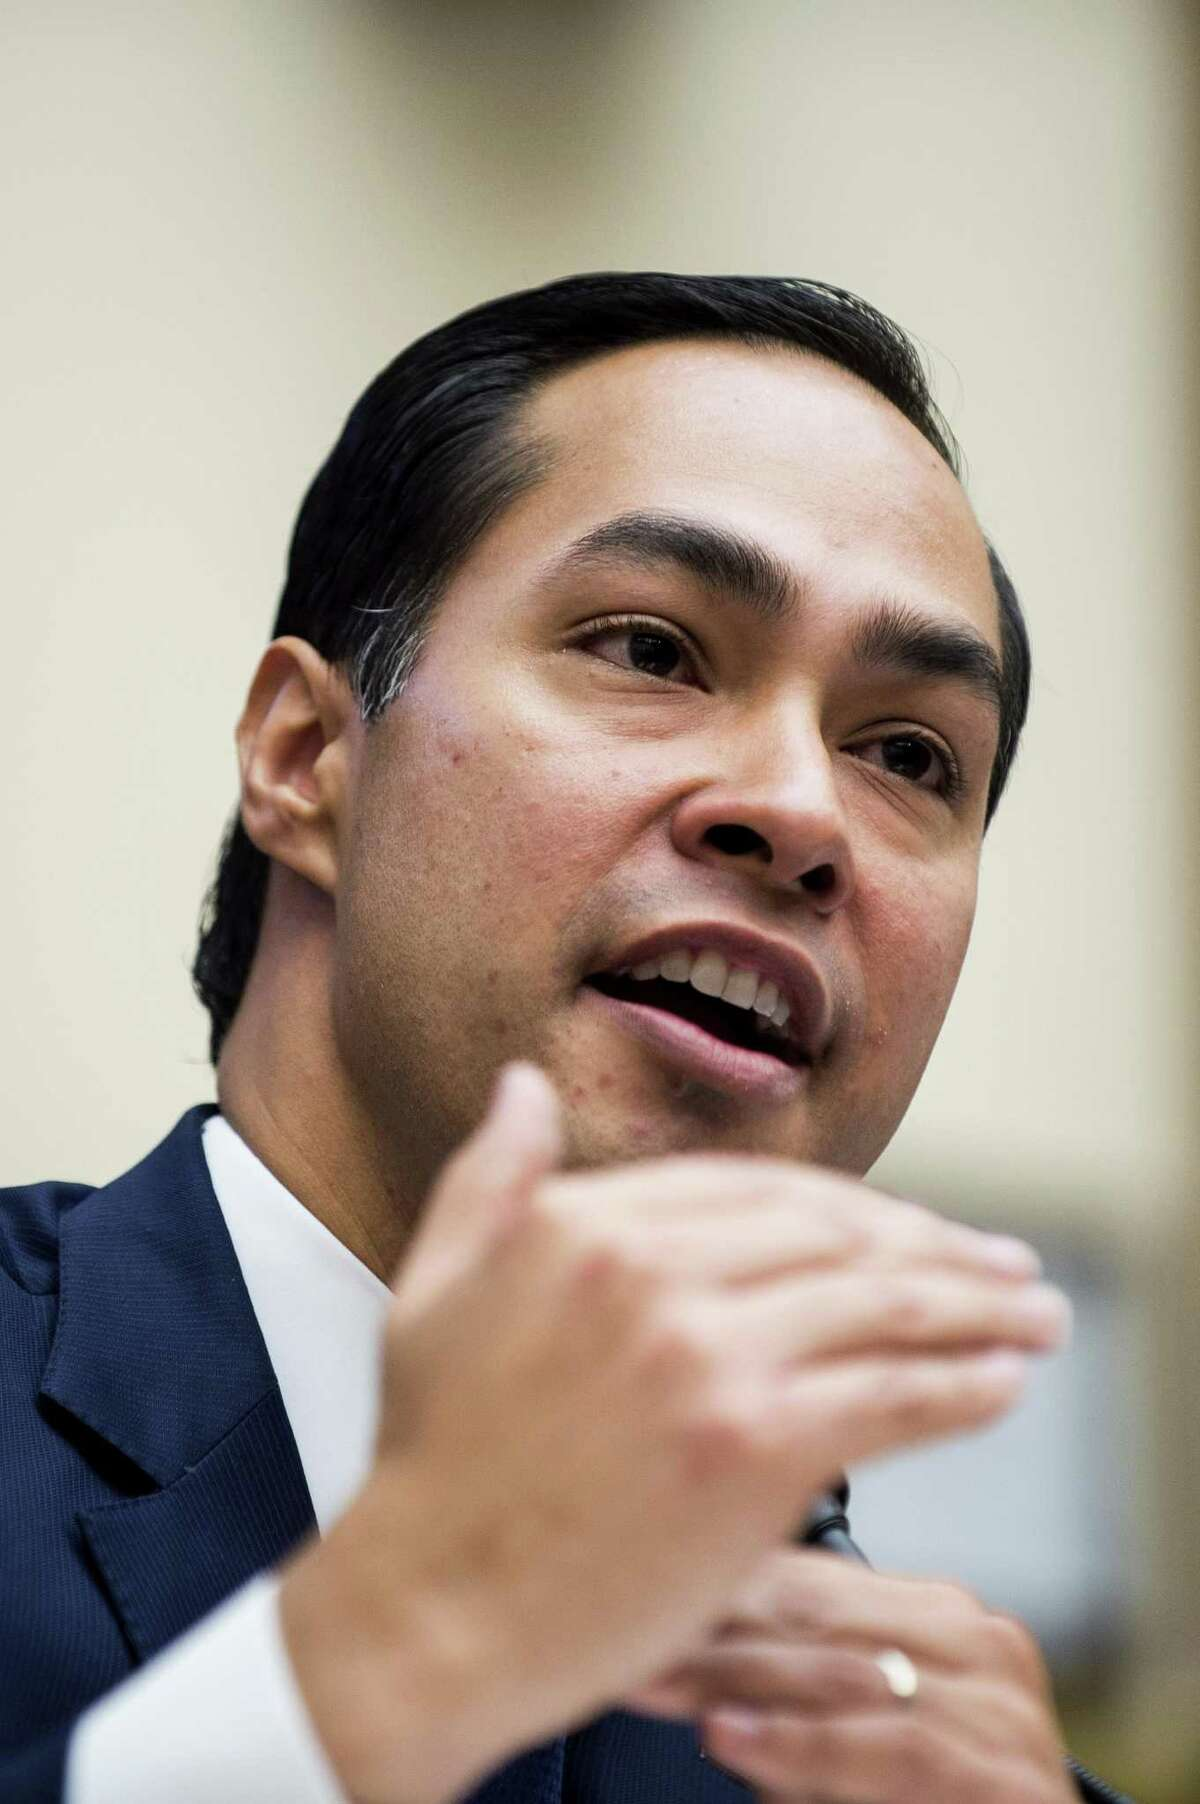 Housing Secretary and San Antonio native Julián Castro, received eight write-in votes.